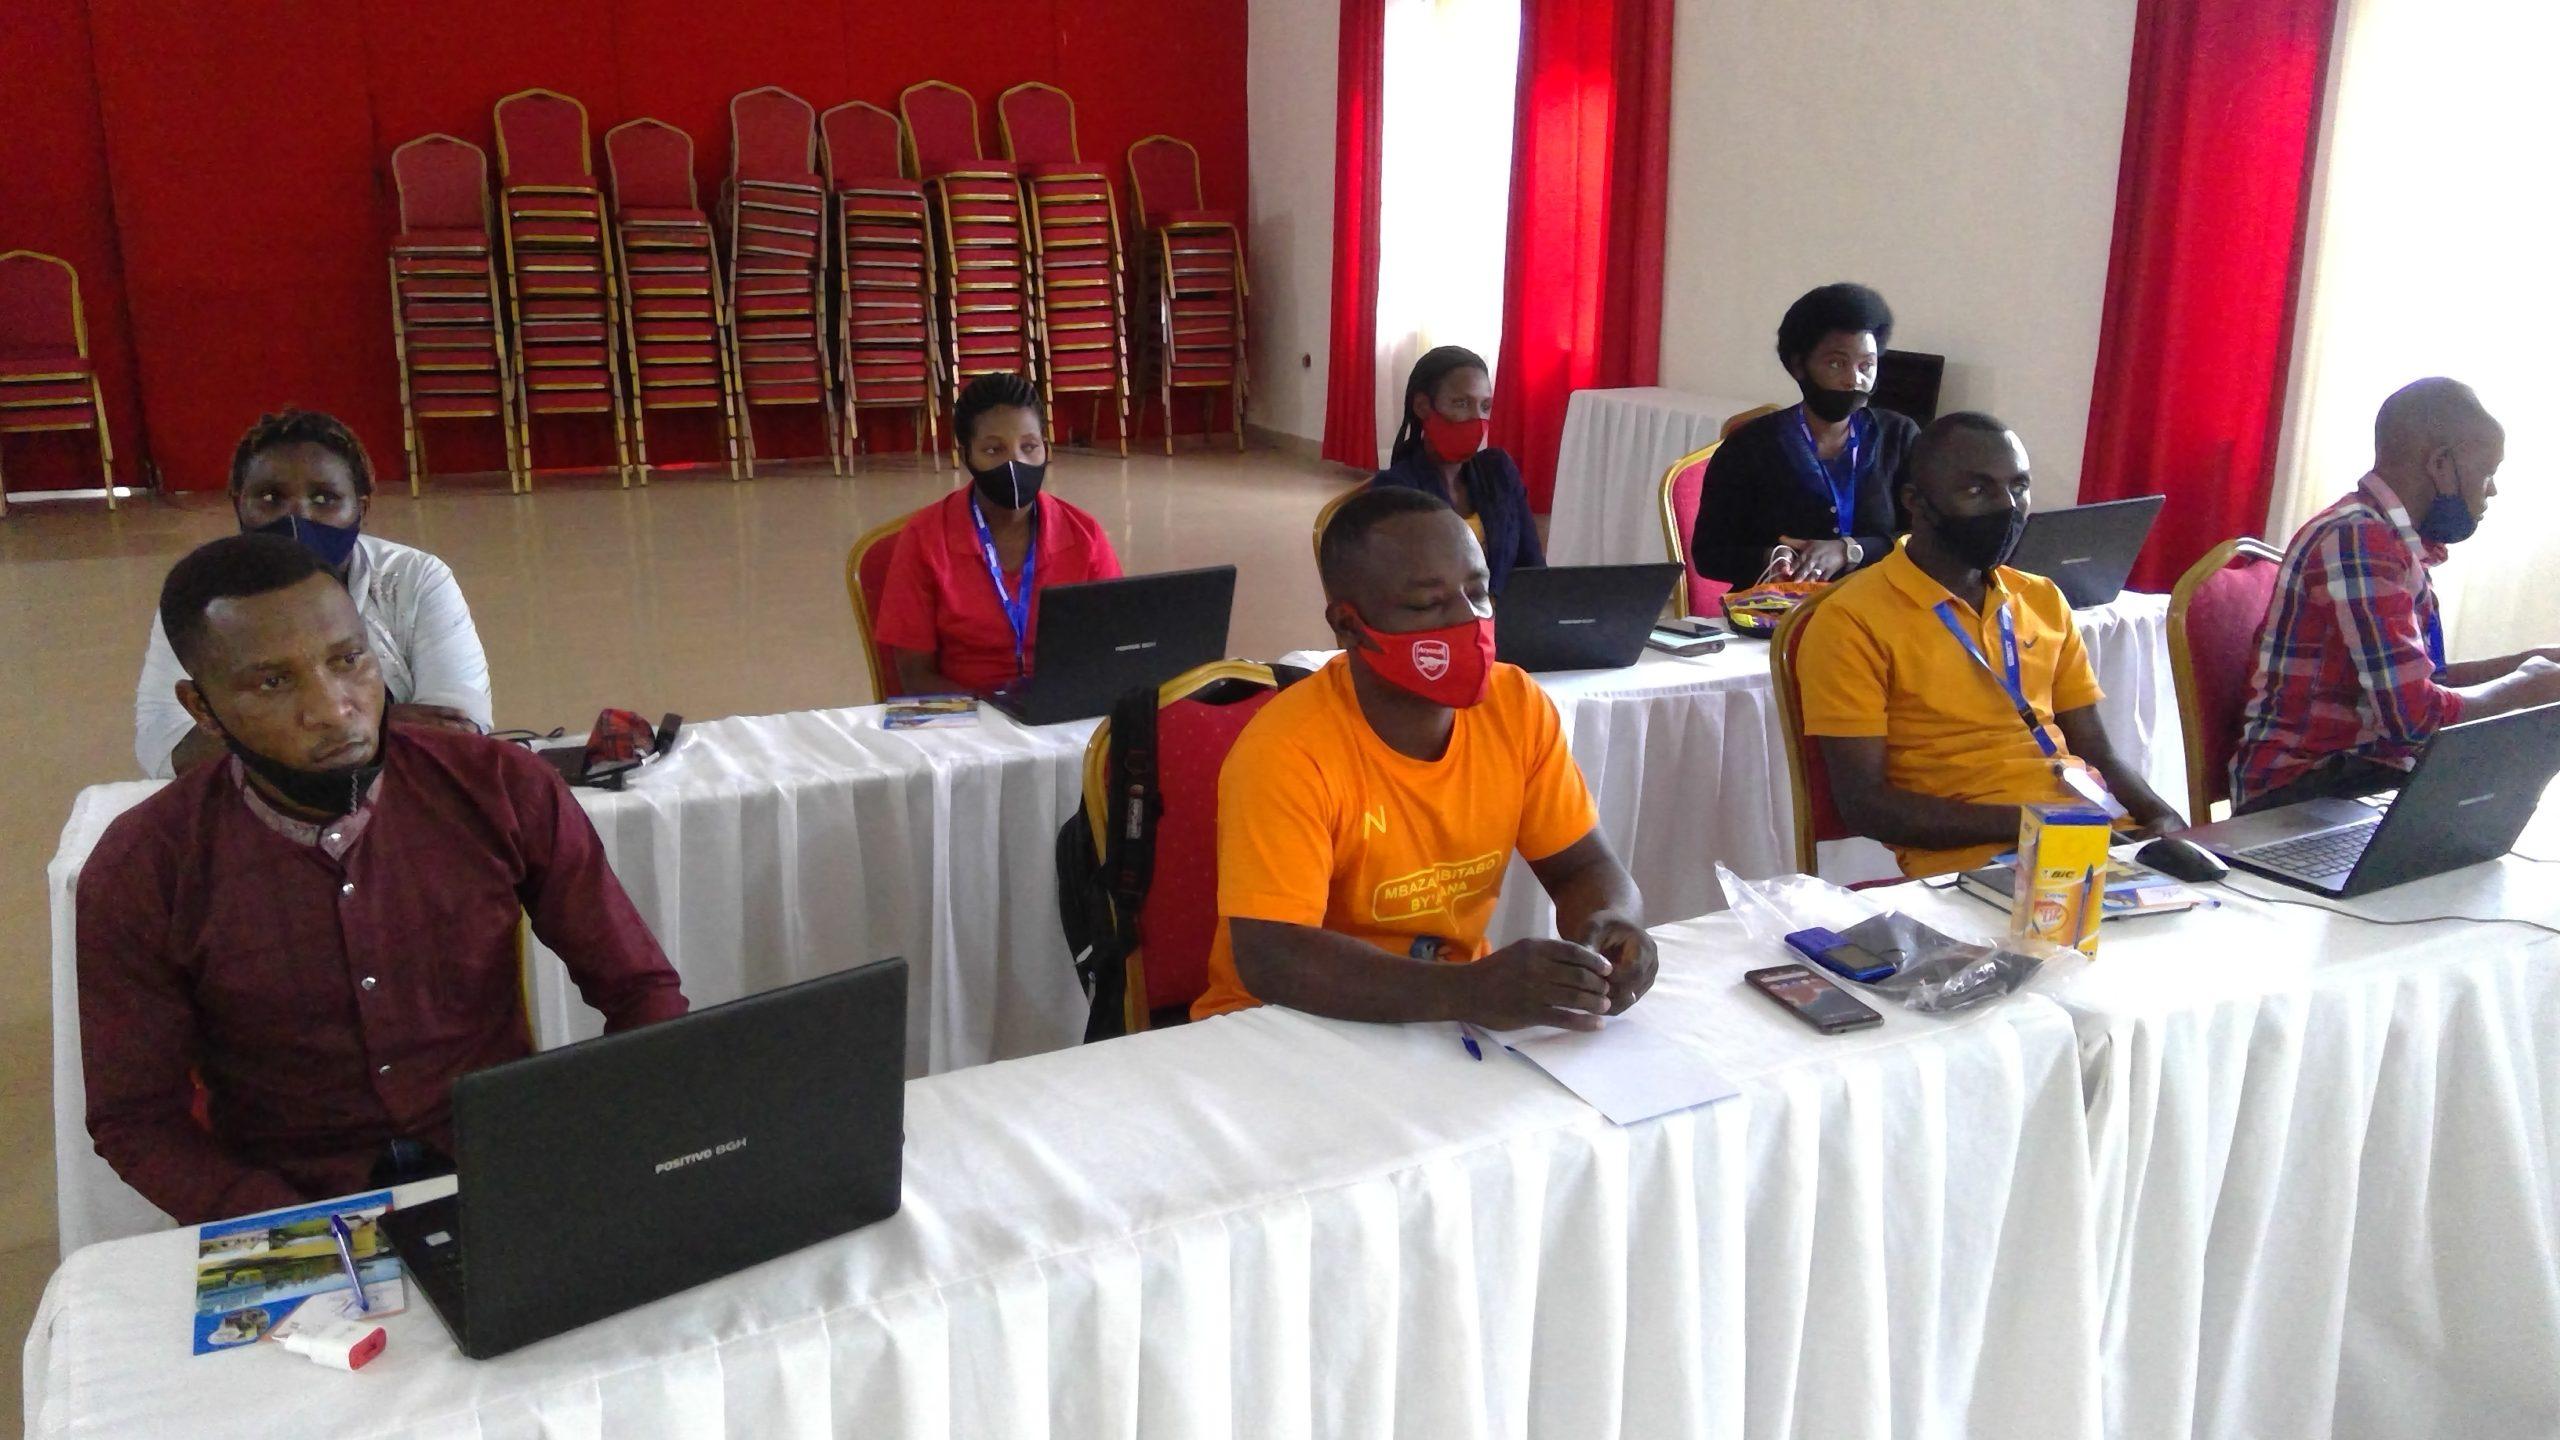 The Digital Ambassador Program in Kayonza, Rwanda